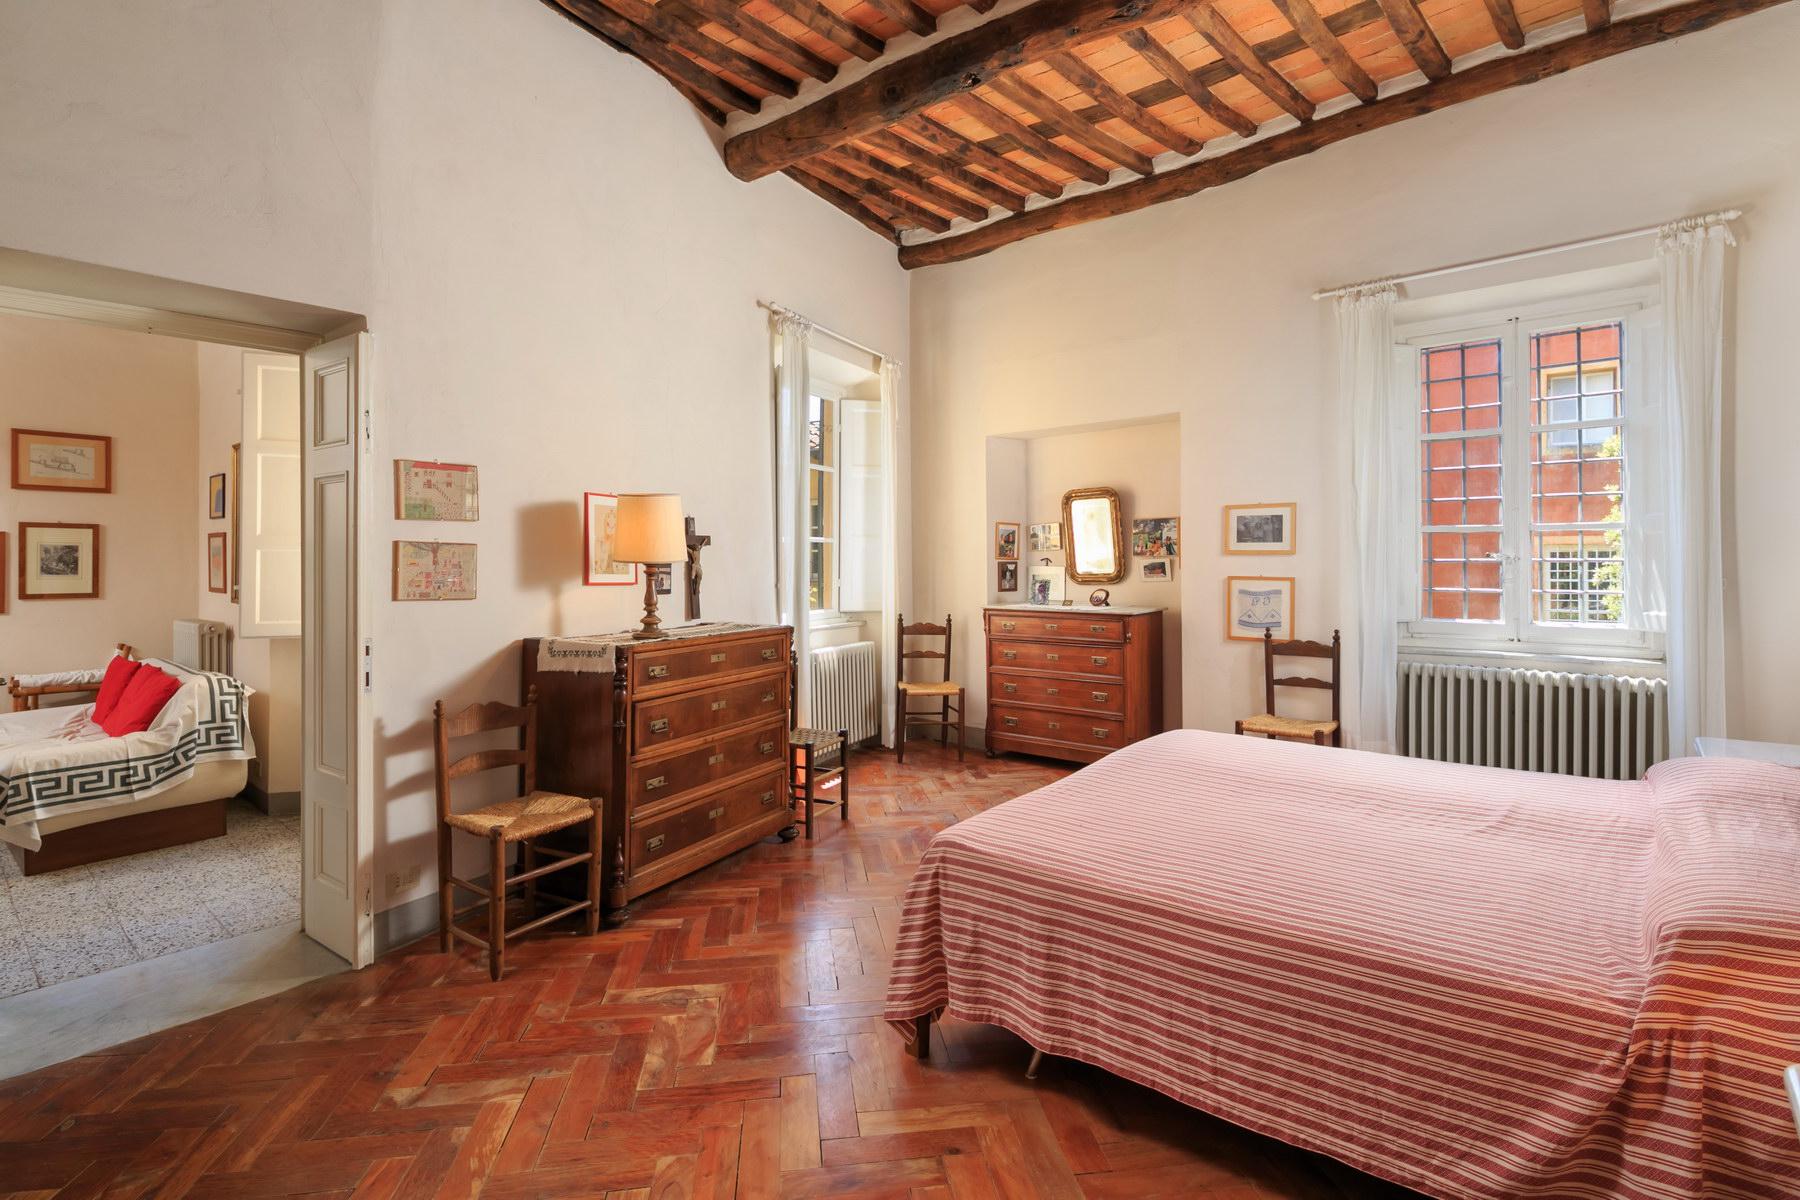 Villa in Vendita a Lucca: 5 locali, 1500 mq - Foto 12